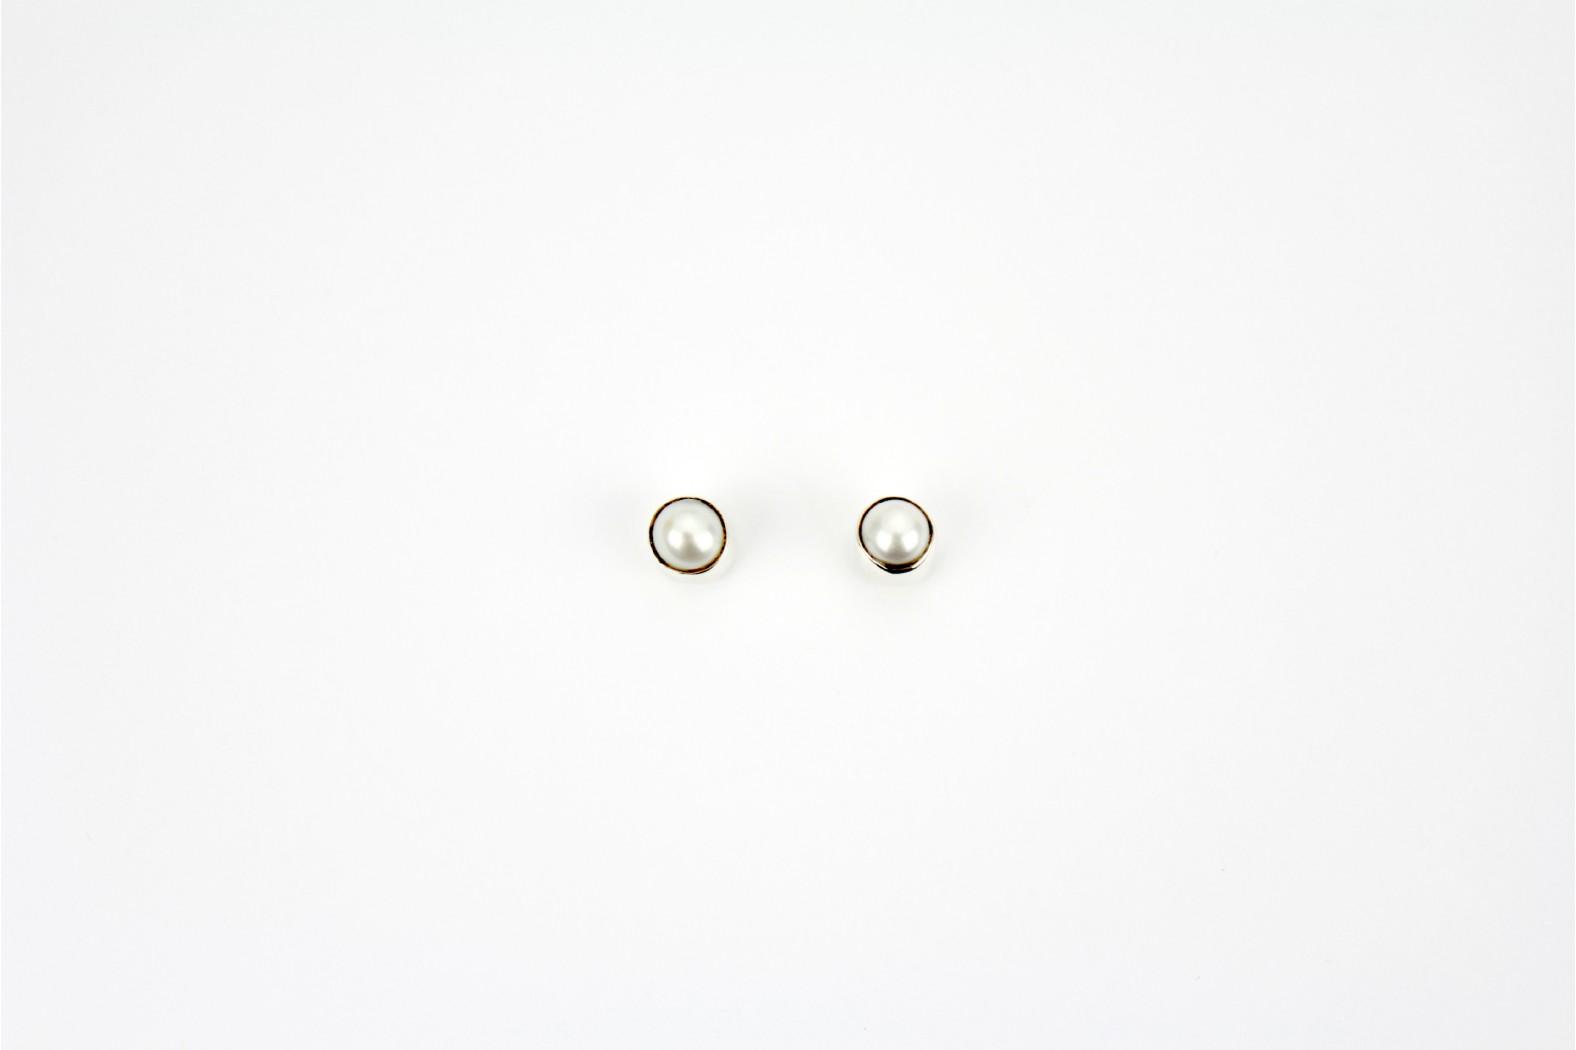 Austrian Crystal claw set stud earrings purple 3mm.small